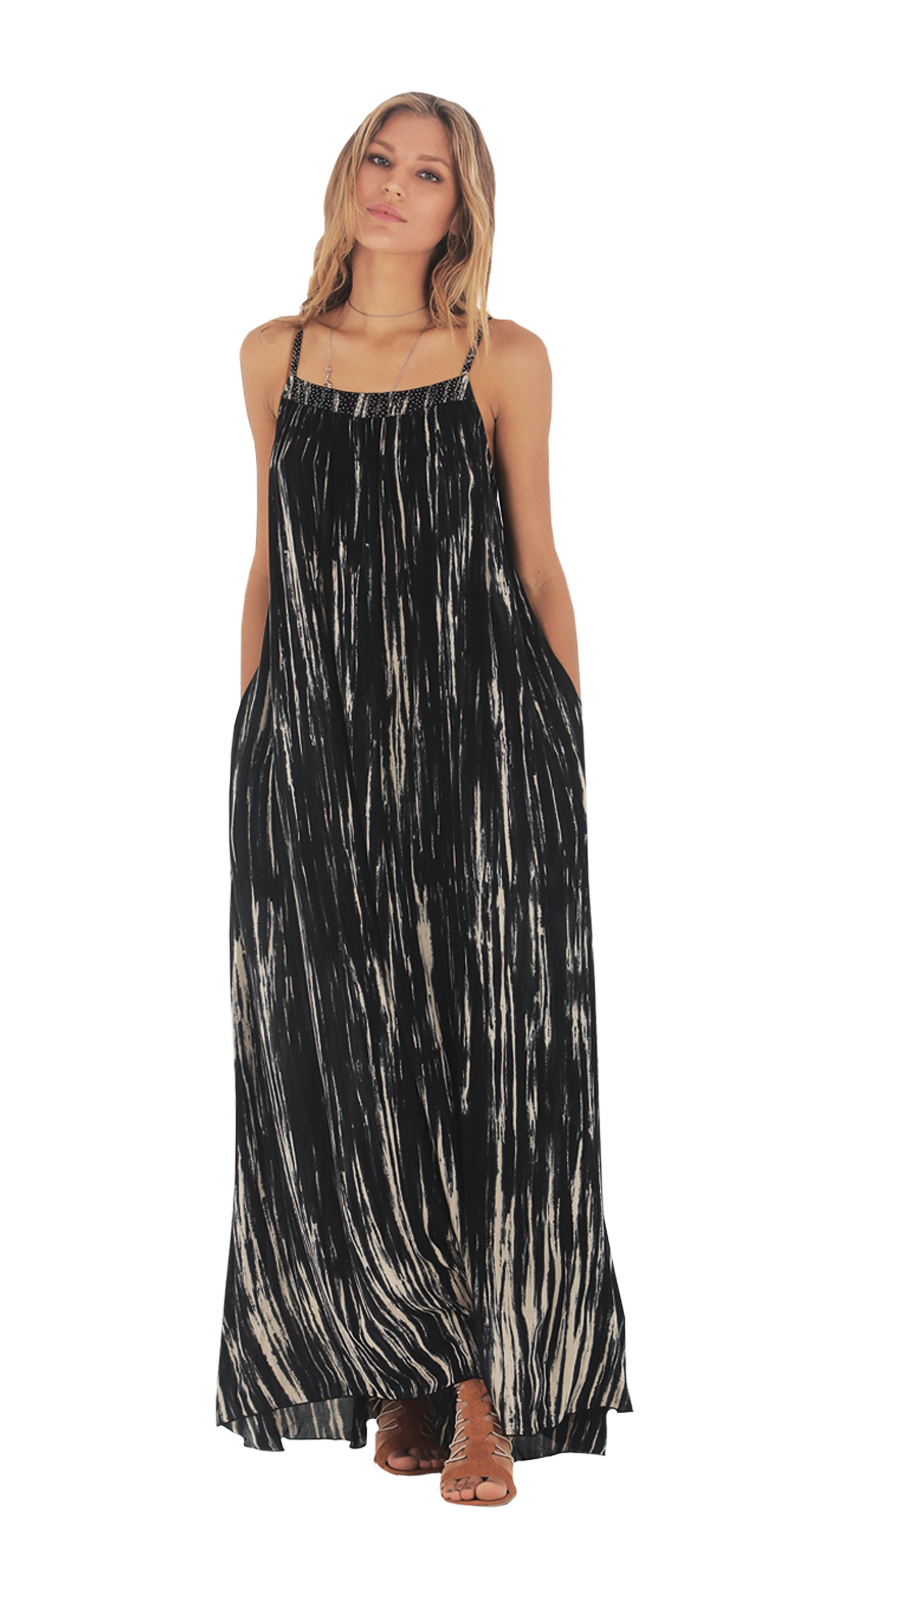 Riva Dress -Fog Black - Front